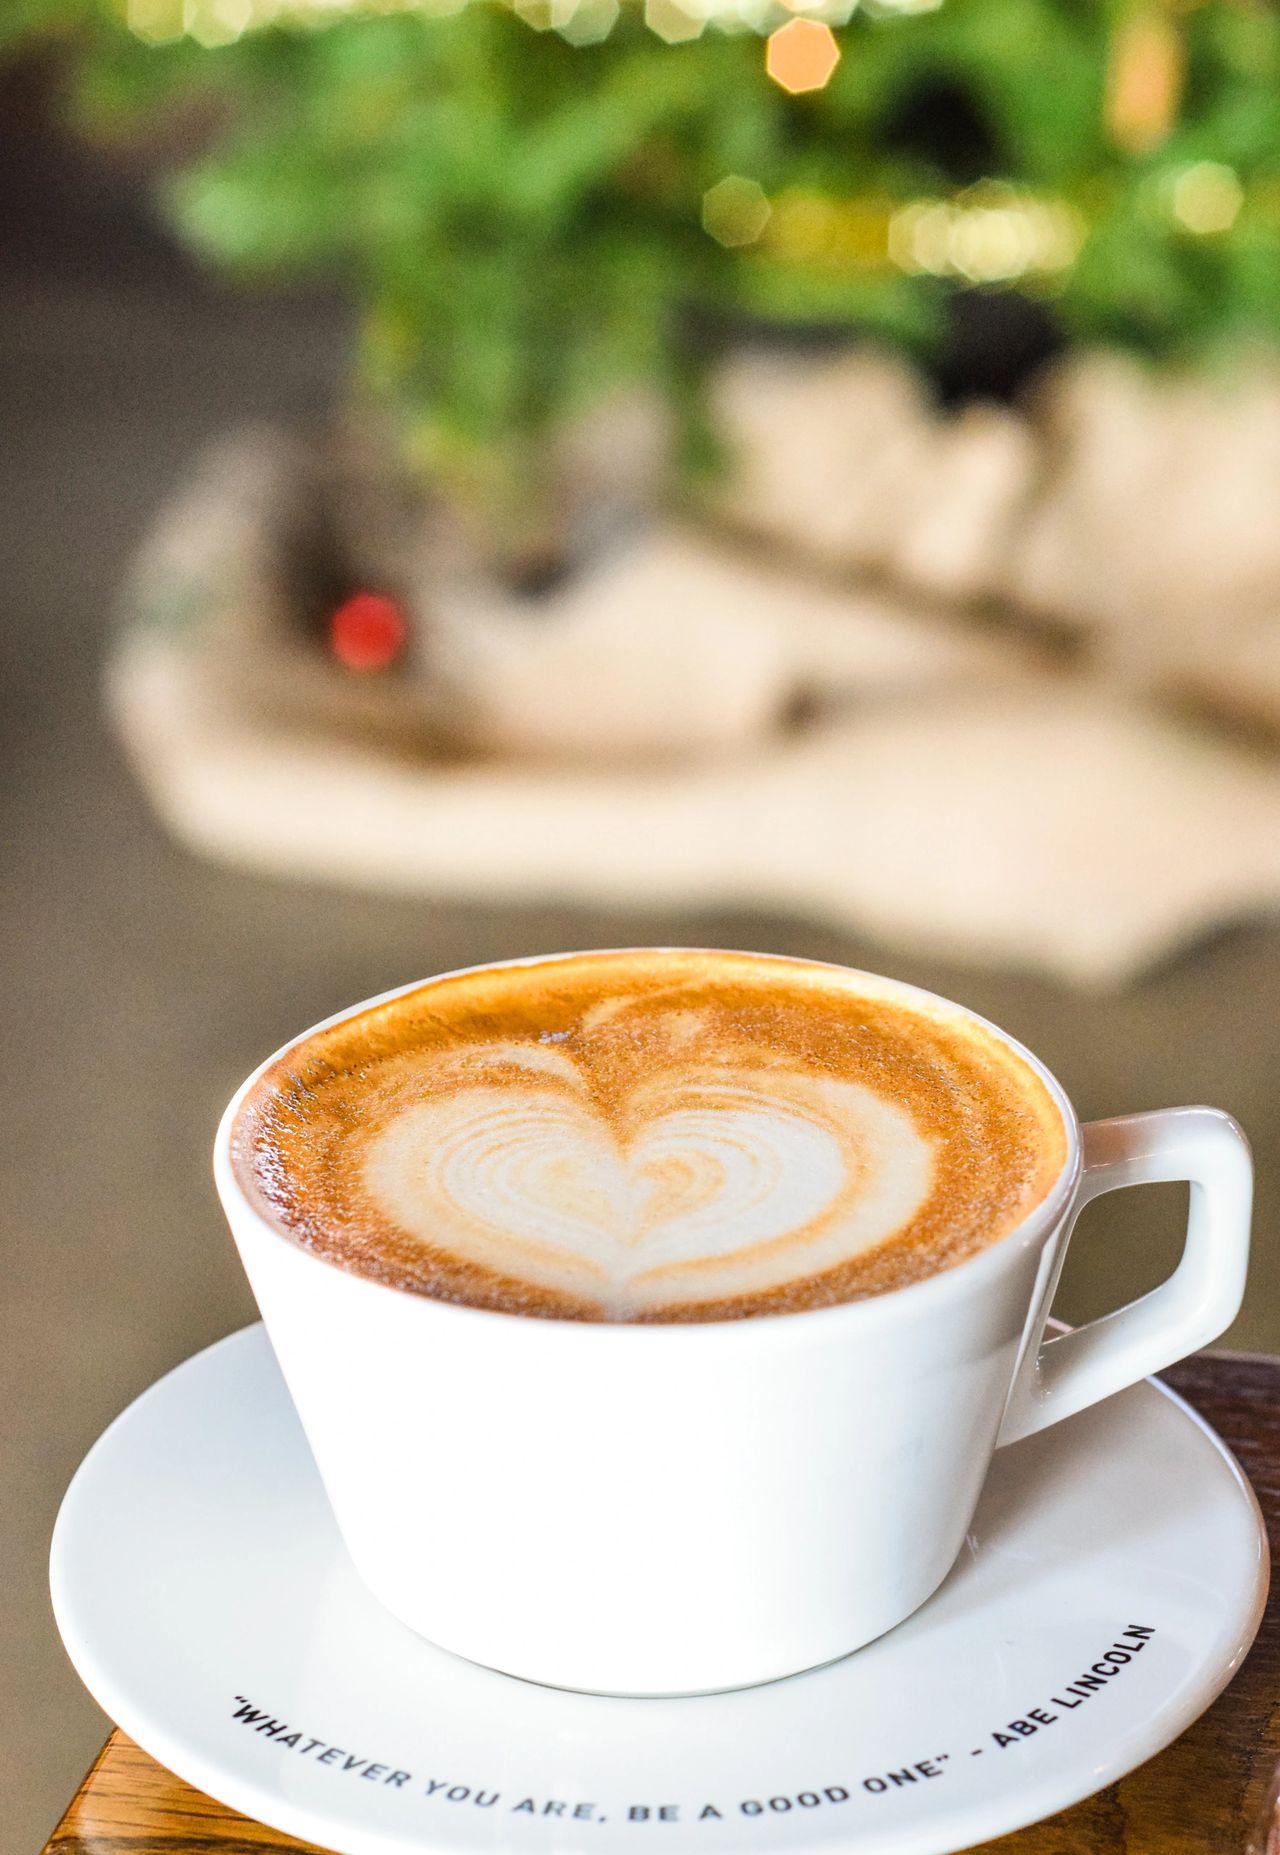 Honest Coffee in Nashville never lies